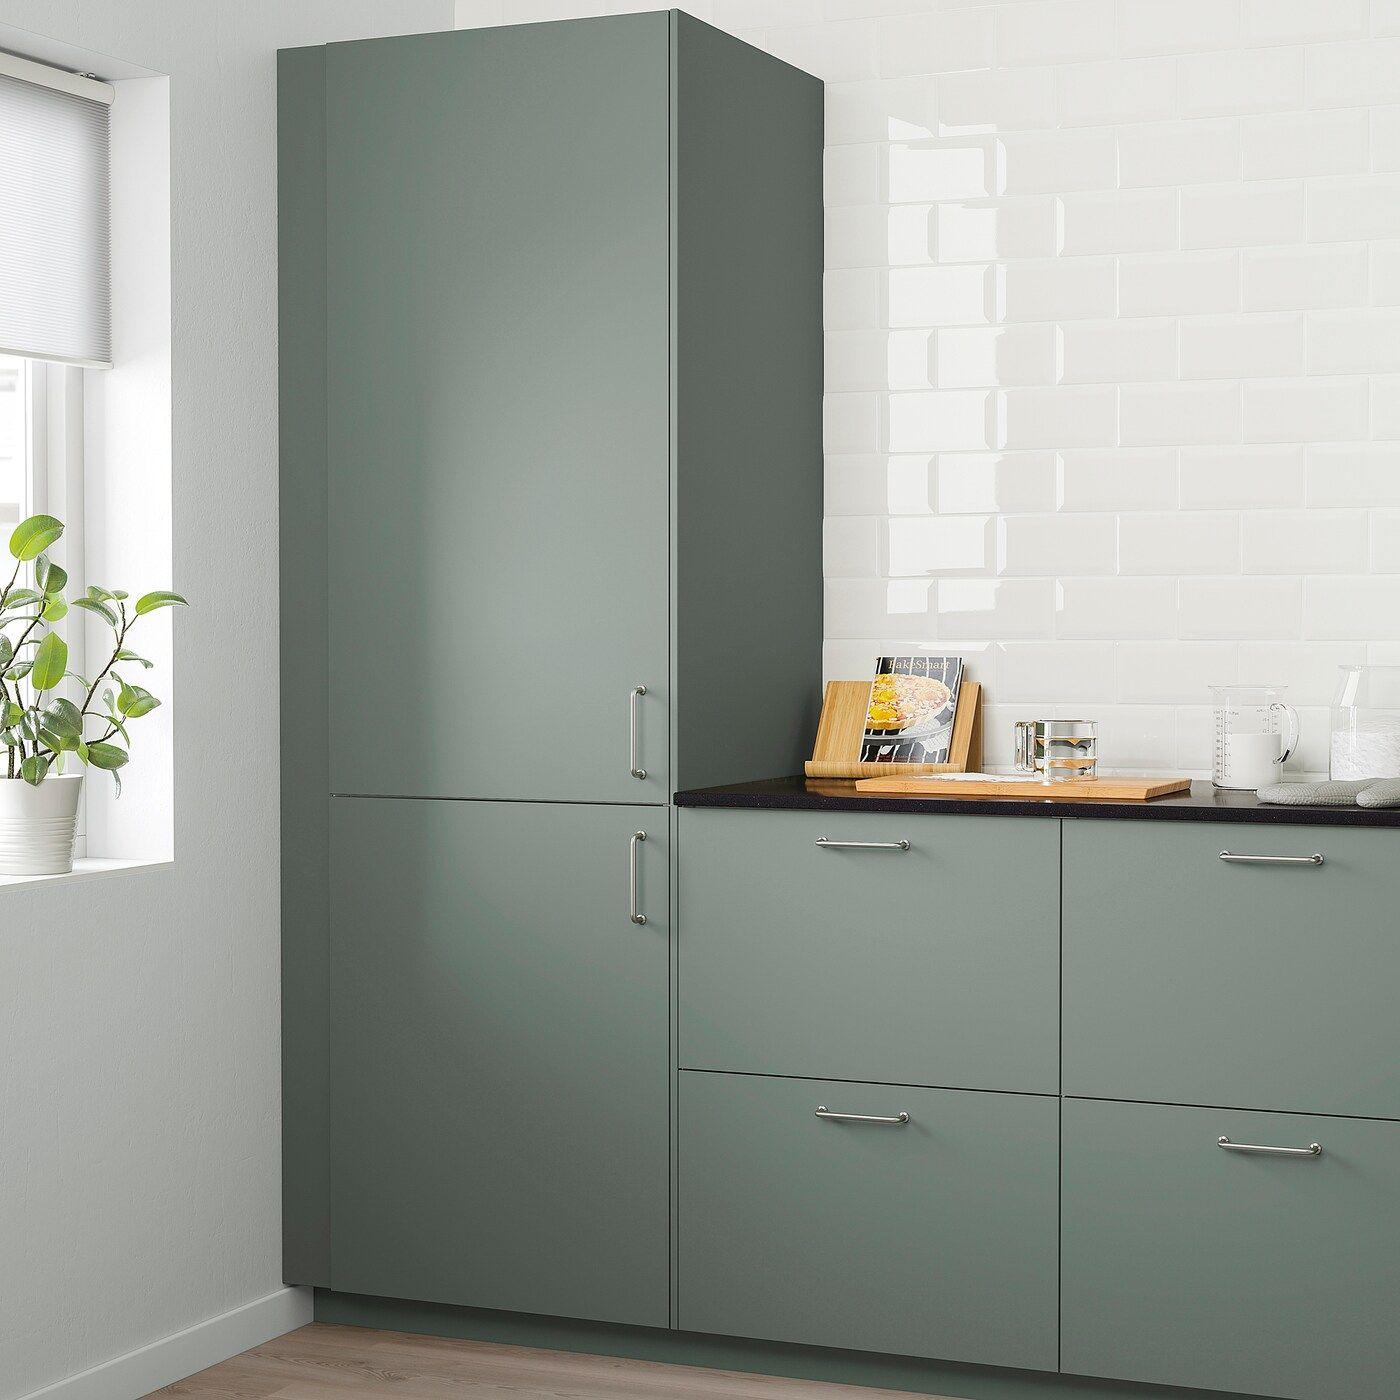 Bodarp Grey Green Door 60x80 Cm Ikea Green Kitchen Cabinets Ikea Kitchen Ikea Ikea com kitchen cabinets